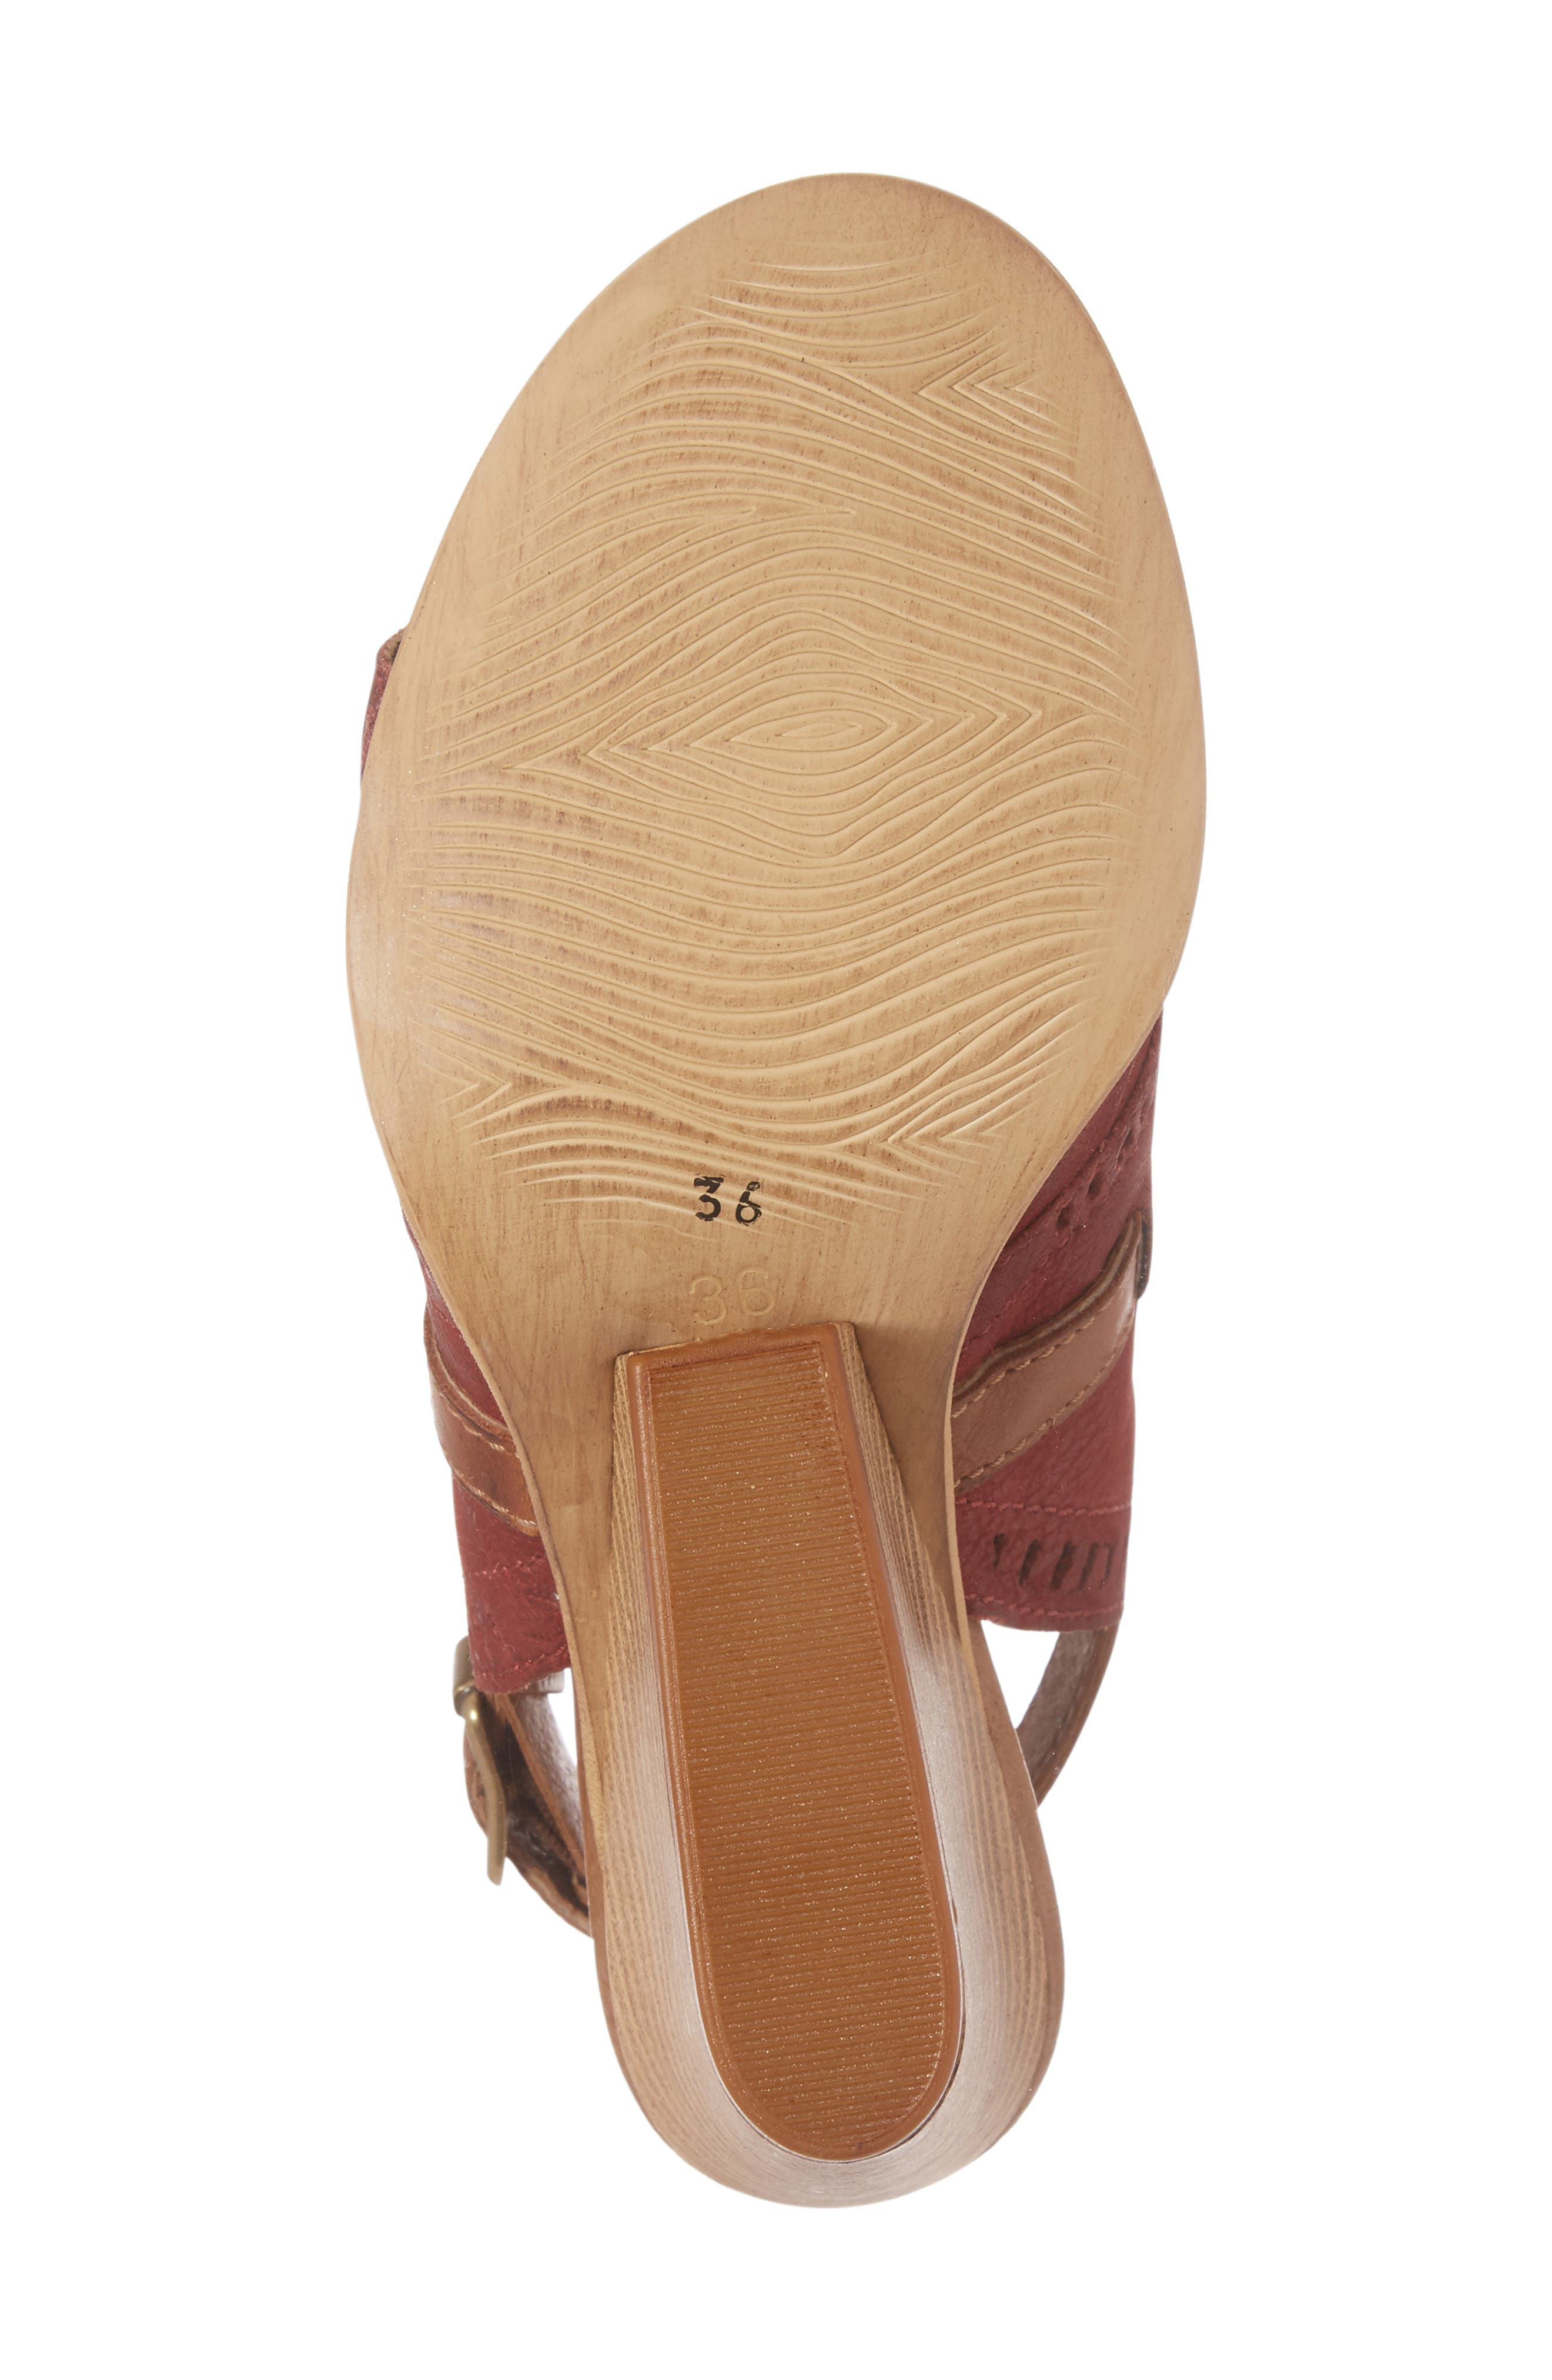 Kipling Perforated Sandal,                             Alternate thumbnail 22, color,